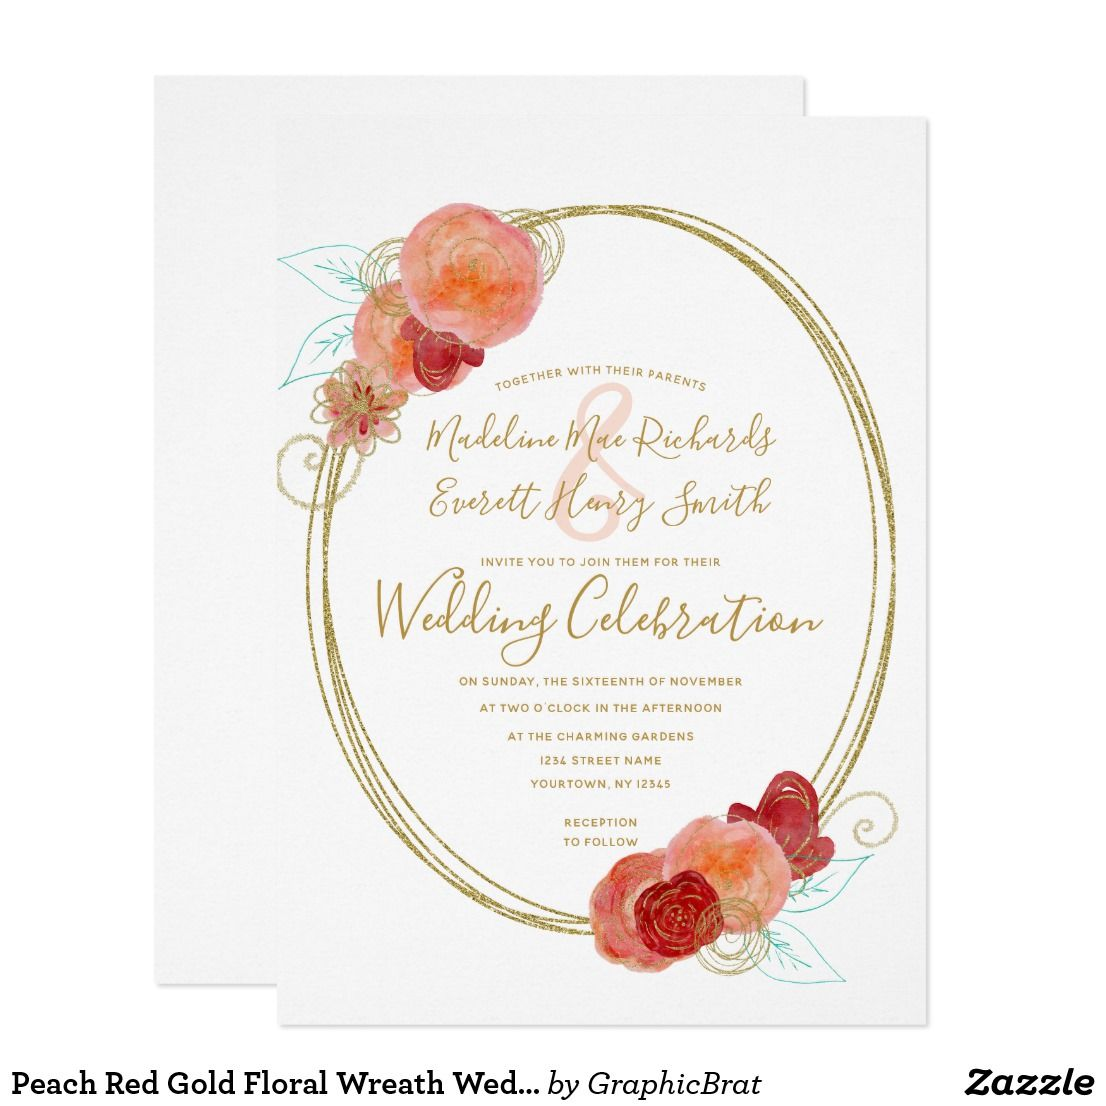 Peach Red Gold Floral Wreath Wedding Invitation | Wedding and Weddings